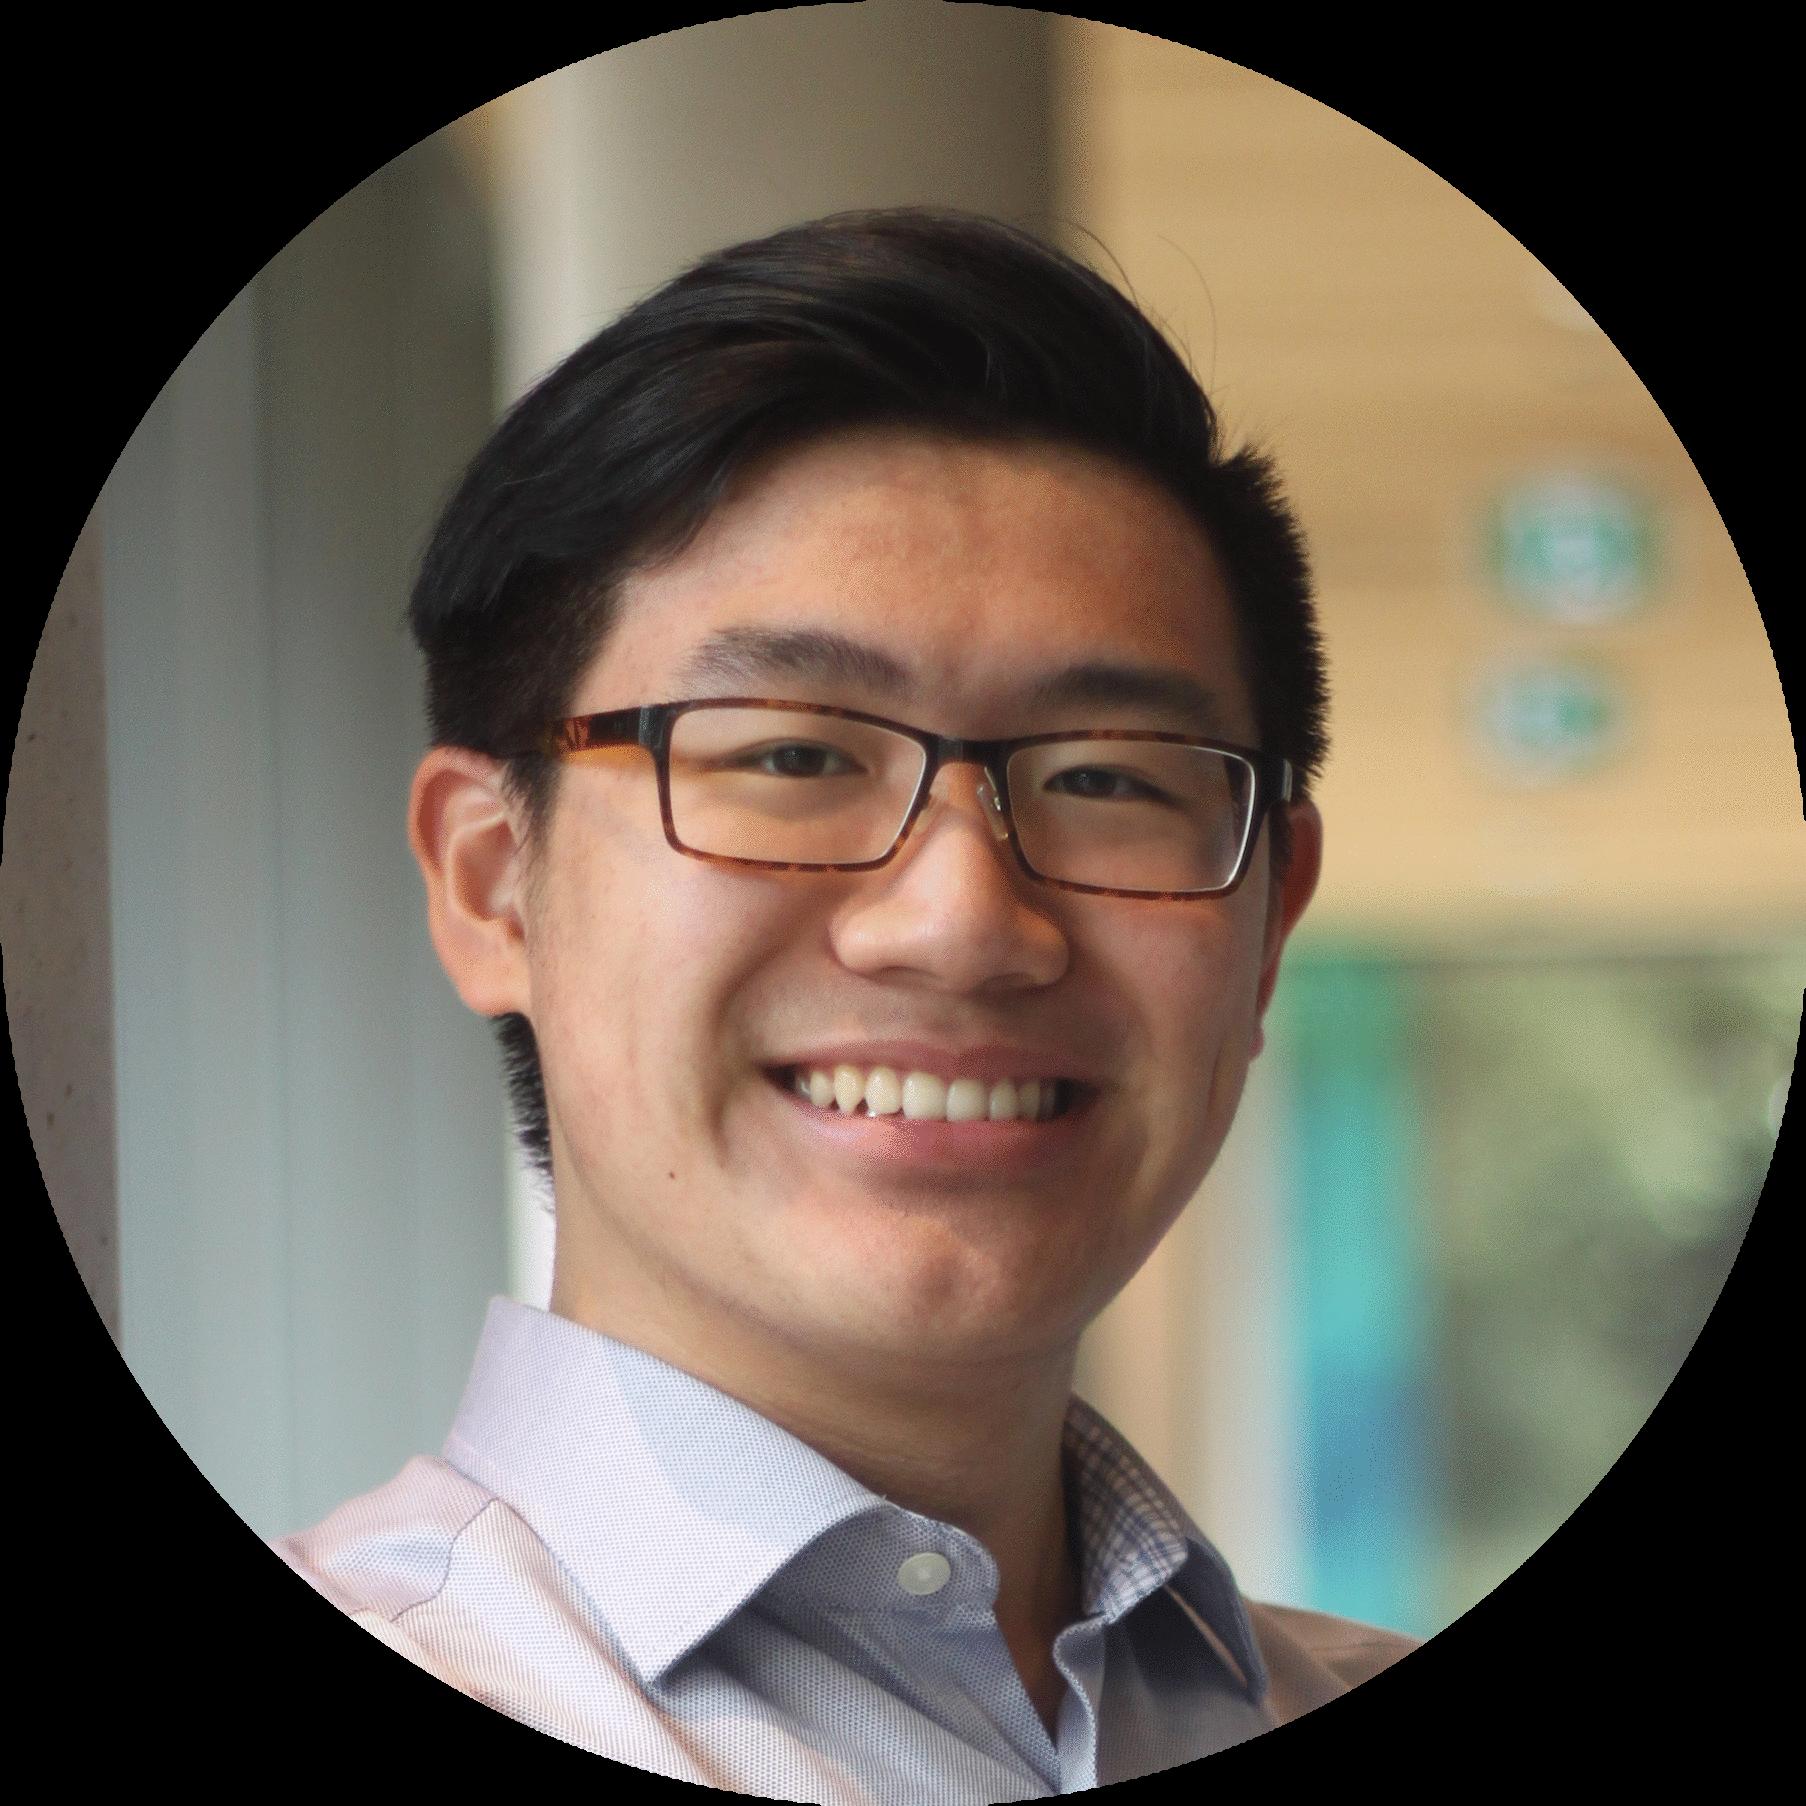 David Guo. Bio/Stats, UBC